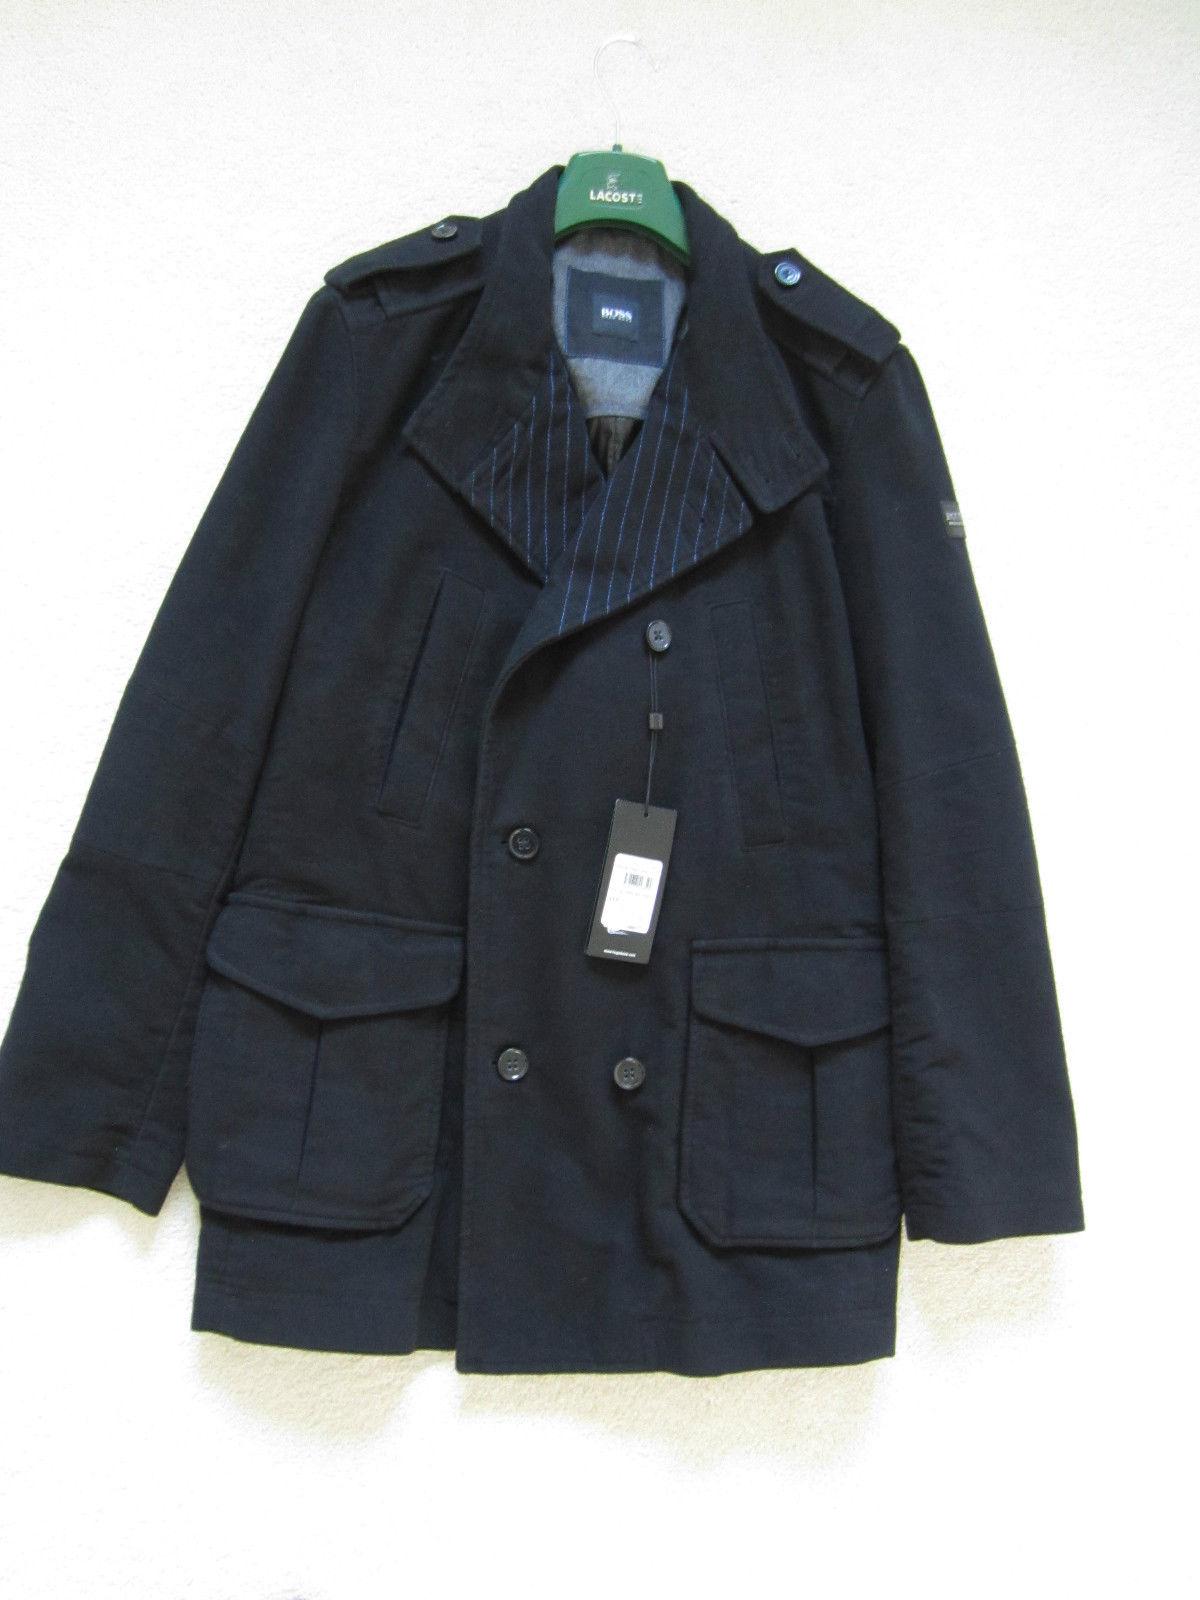 hugo boss men 39 s black pea style winter coat size 44 54. Black Bedroom Furniture Sets. Home Design Ideas